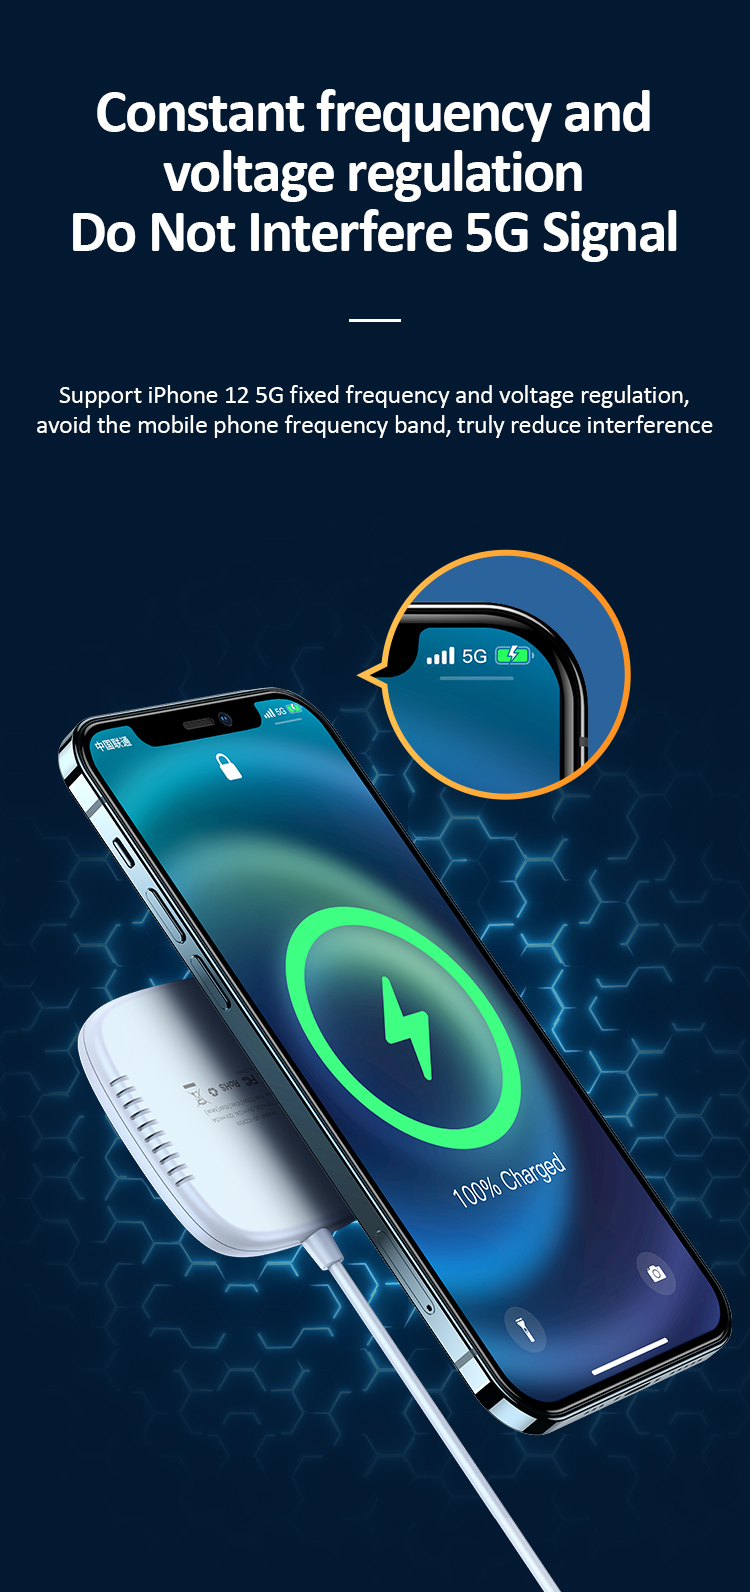 W1-苹果超薄磁吸无线快充充电器带线款-US-CD159_07